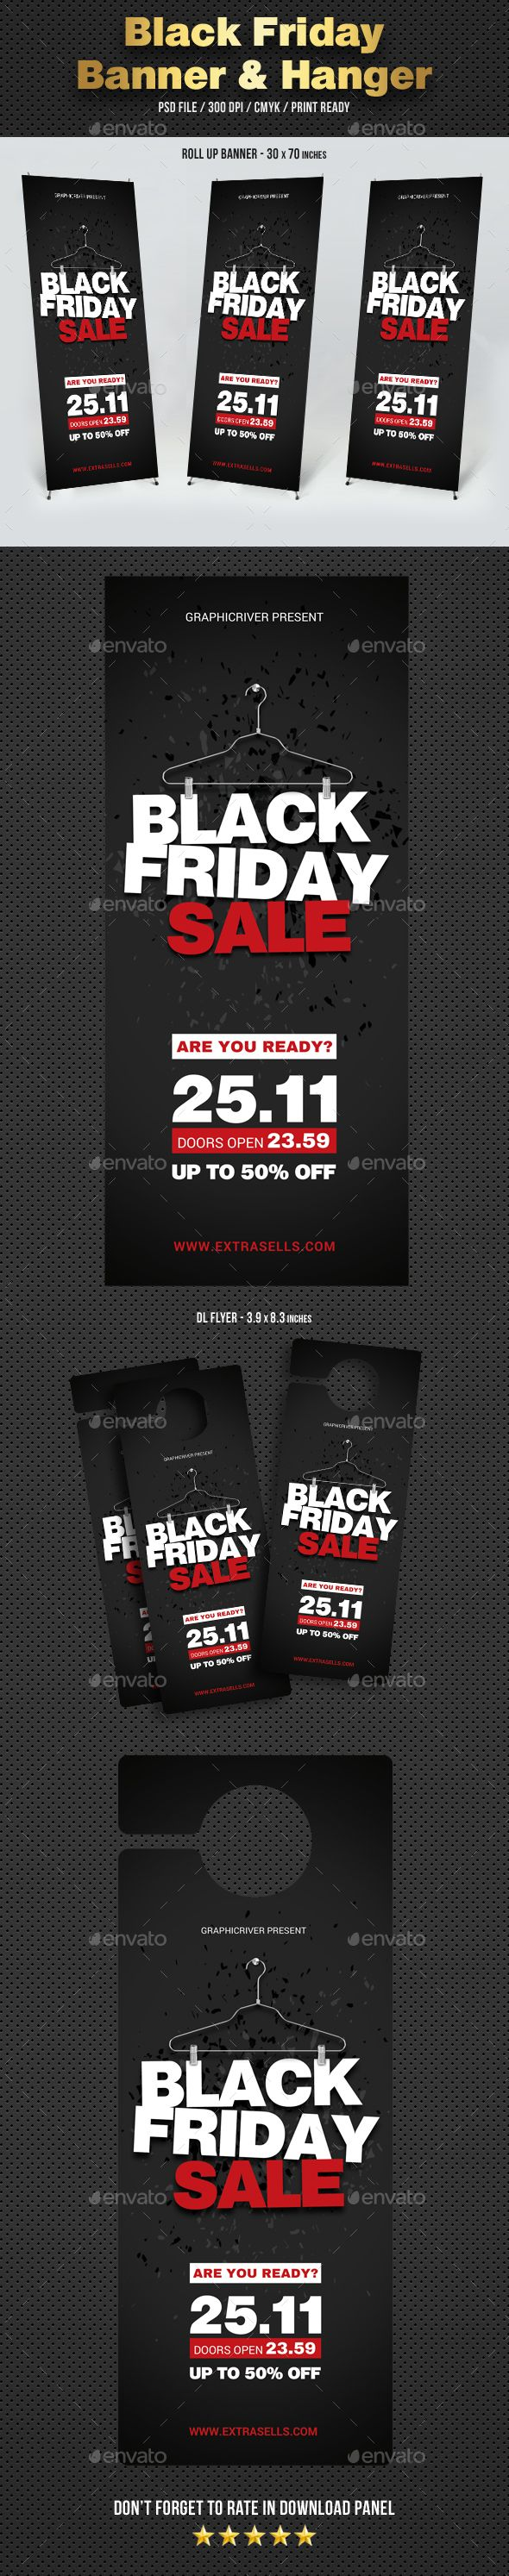 Black Friday #Banner and #Door Hanger - #Signage Print Templates ...